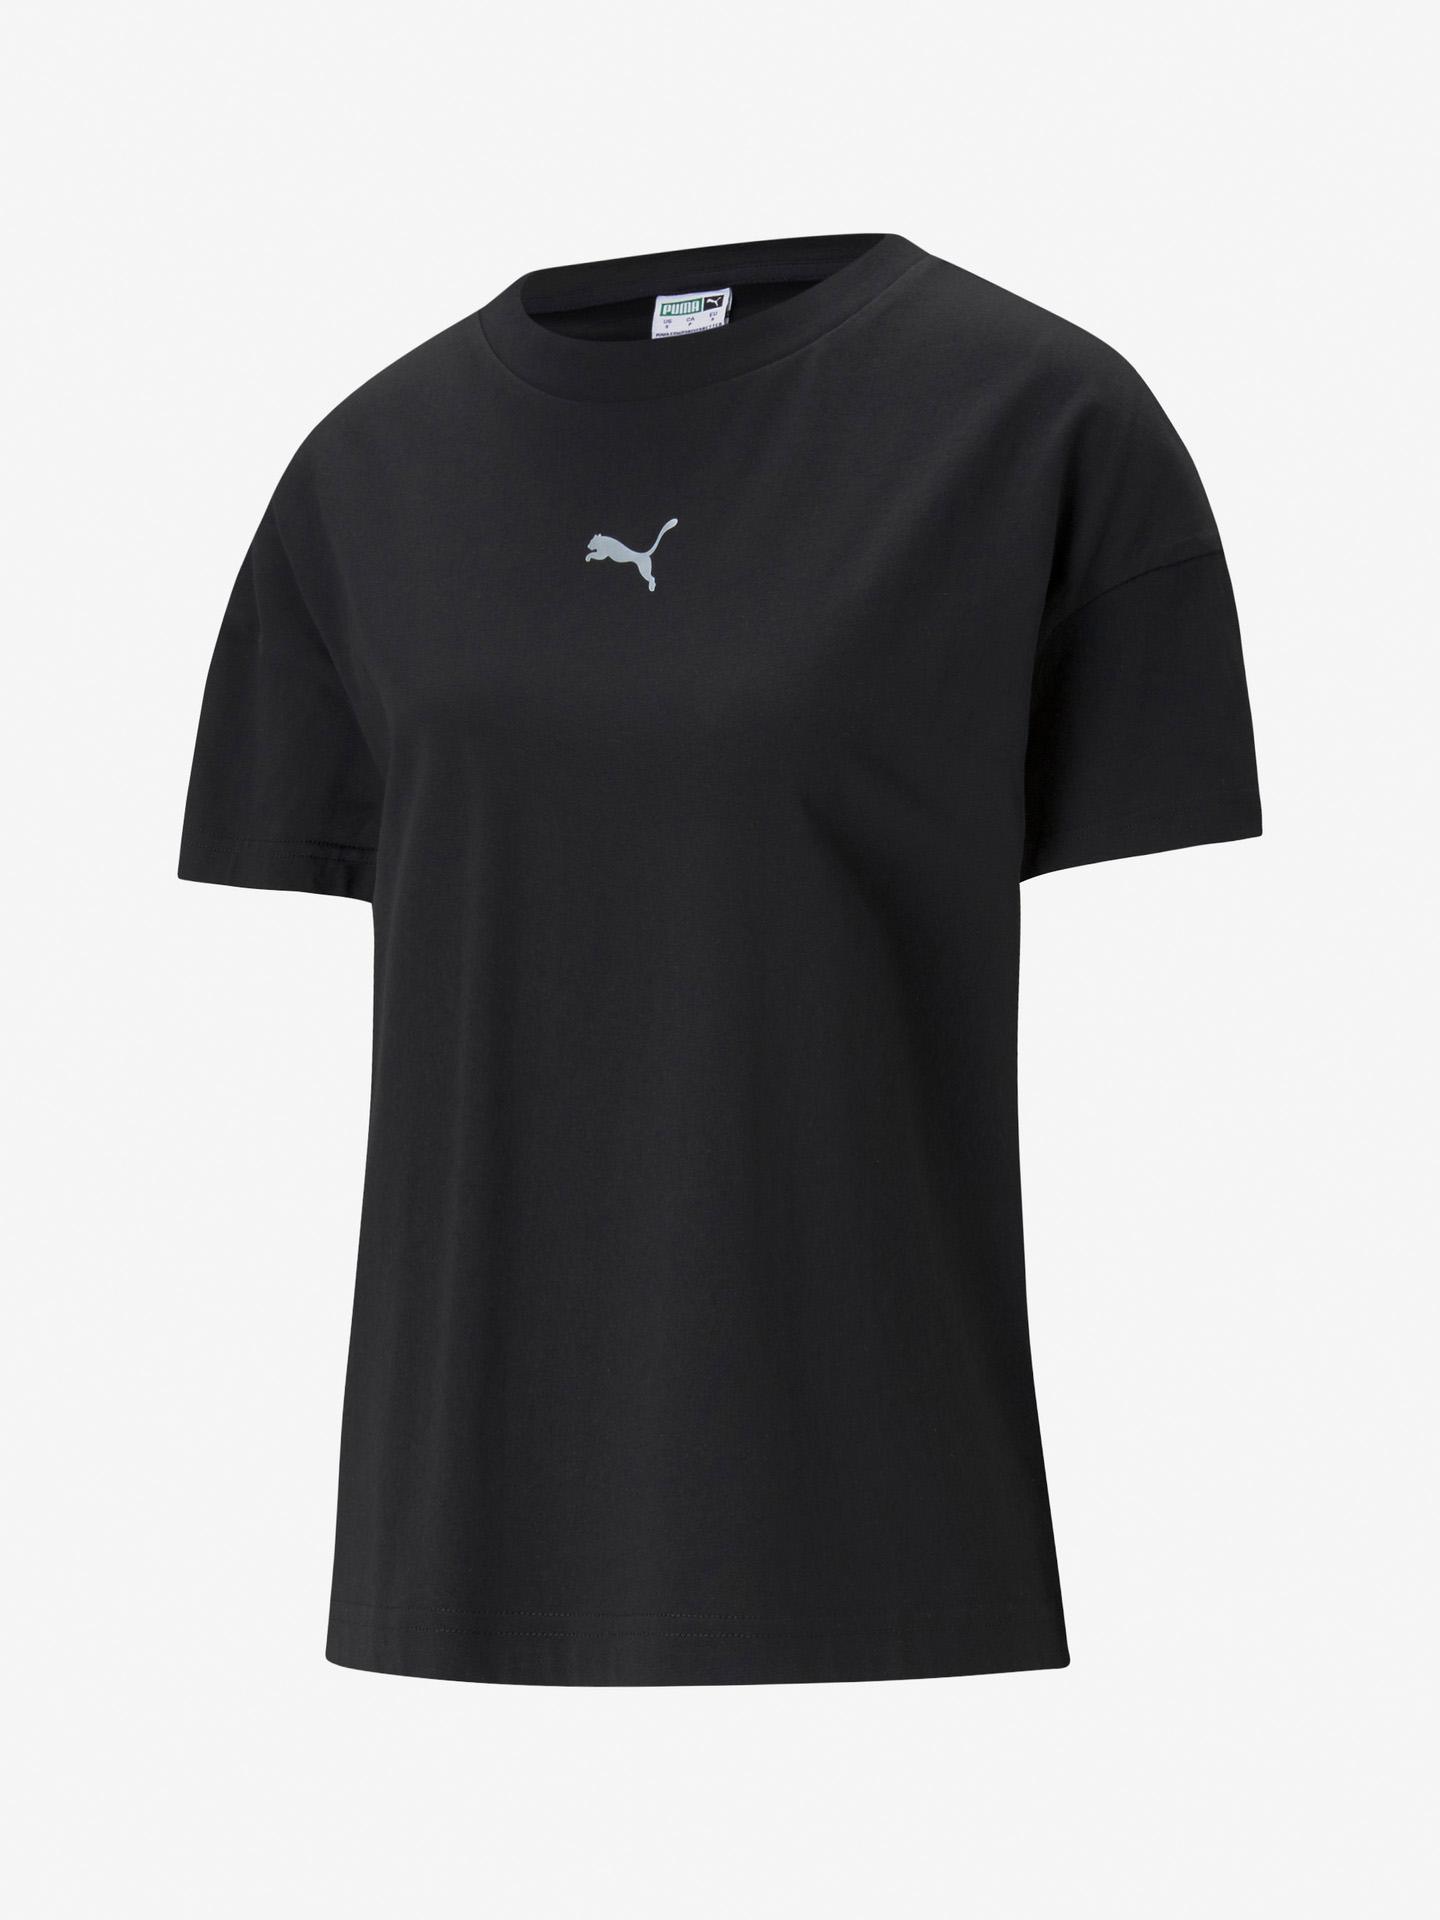 Puma Evide Graphic Koszulka Czarny